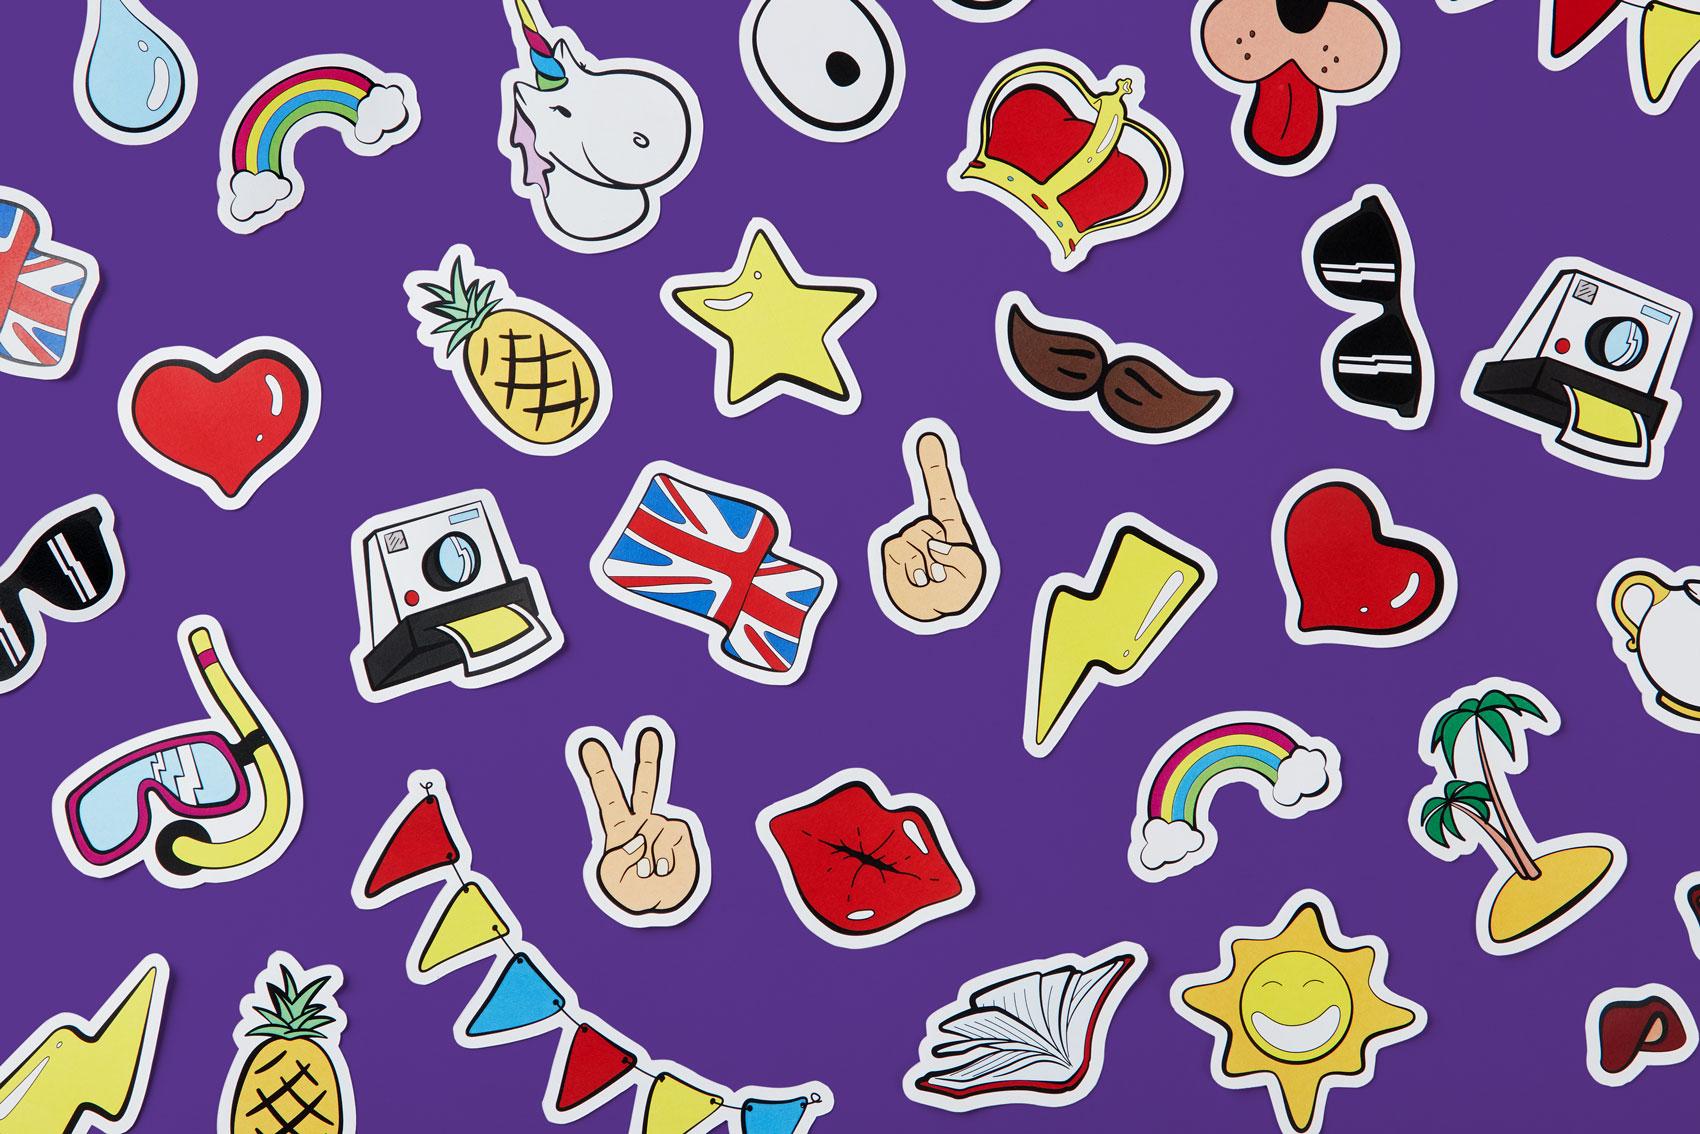 Branding Cambridge School Comunicación gráfica ilustración diseño stickers etiquetas Vibranding